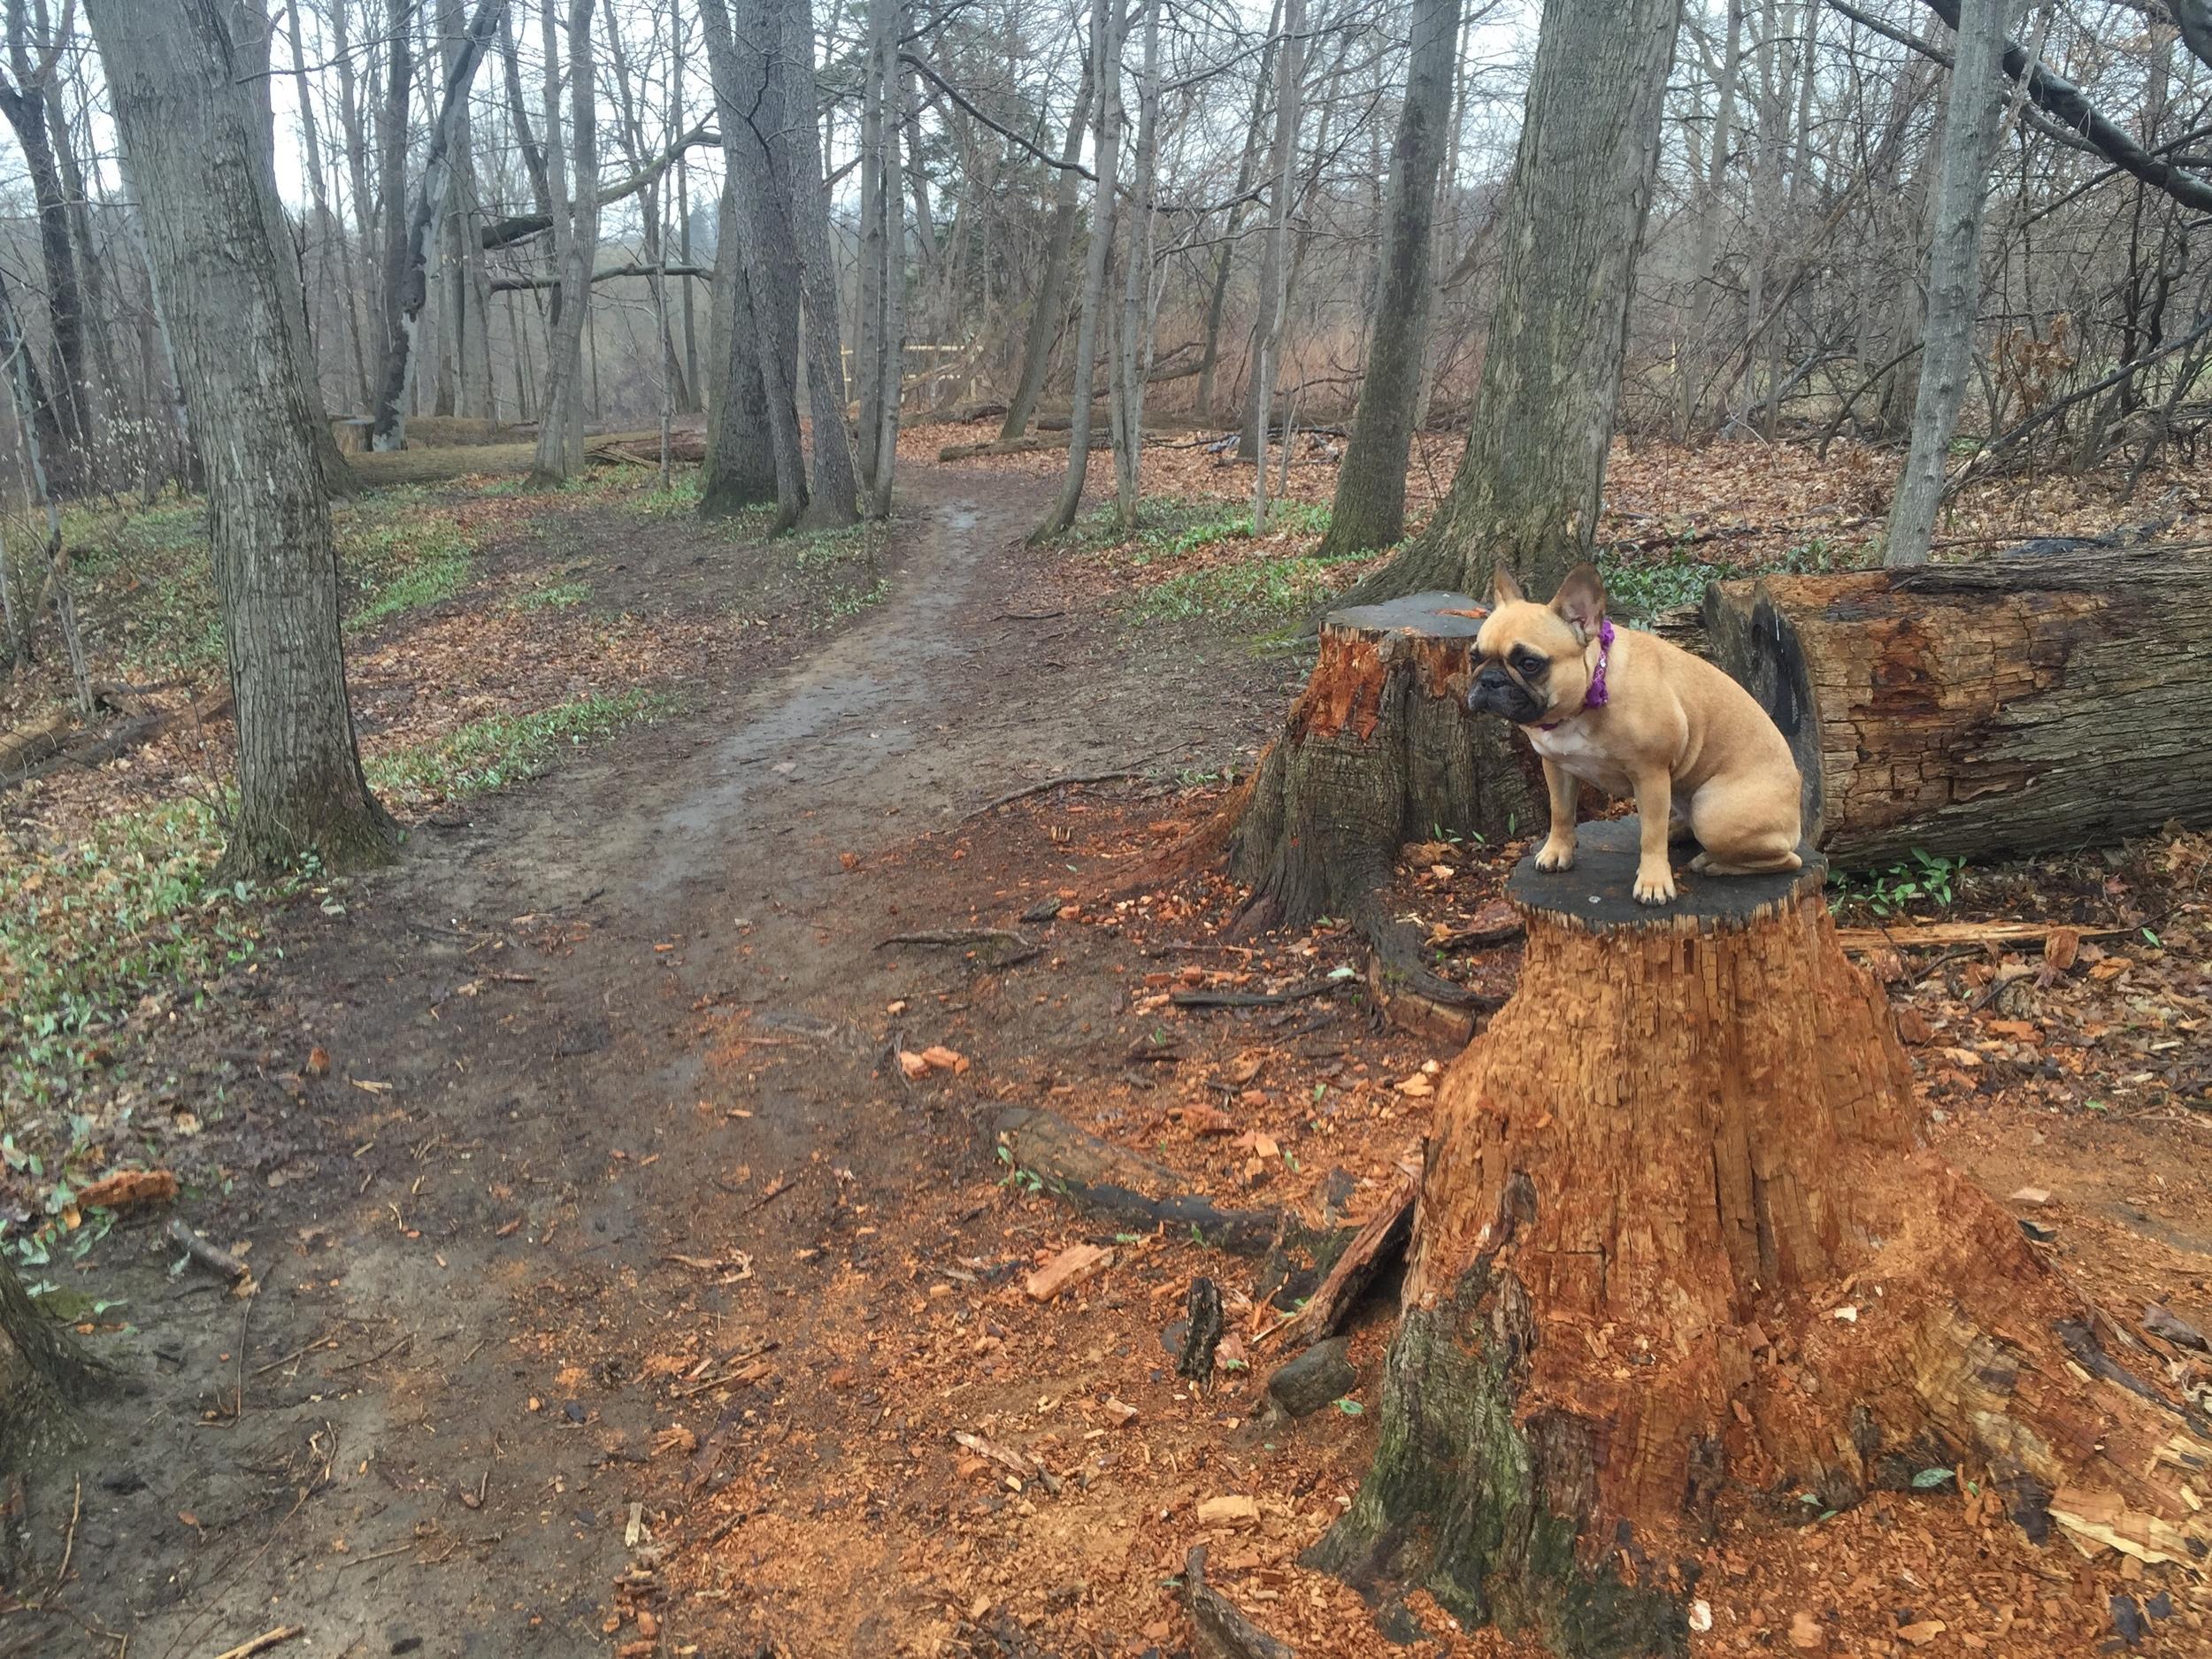 THIS TREEFOOT IS DISAVANISHING!!